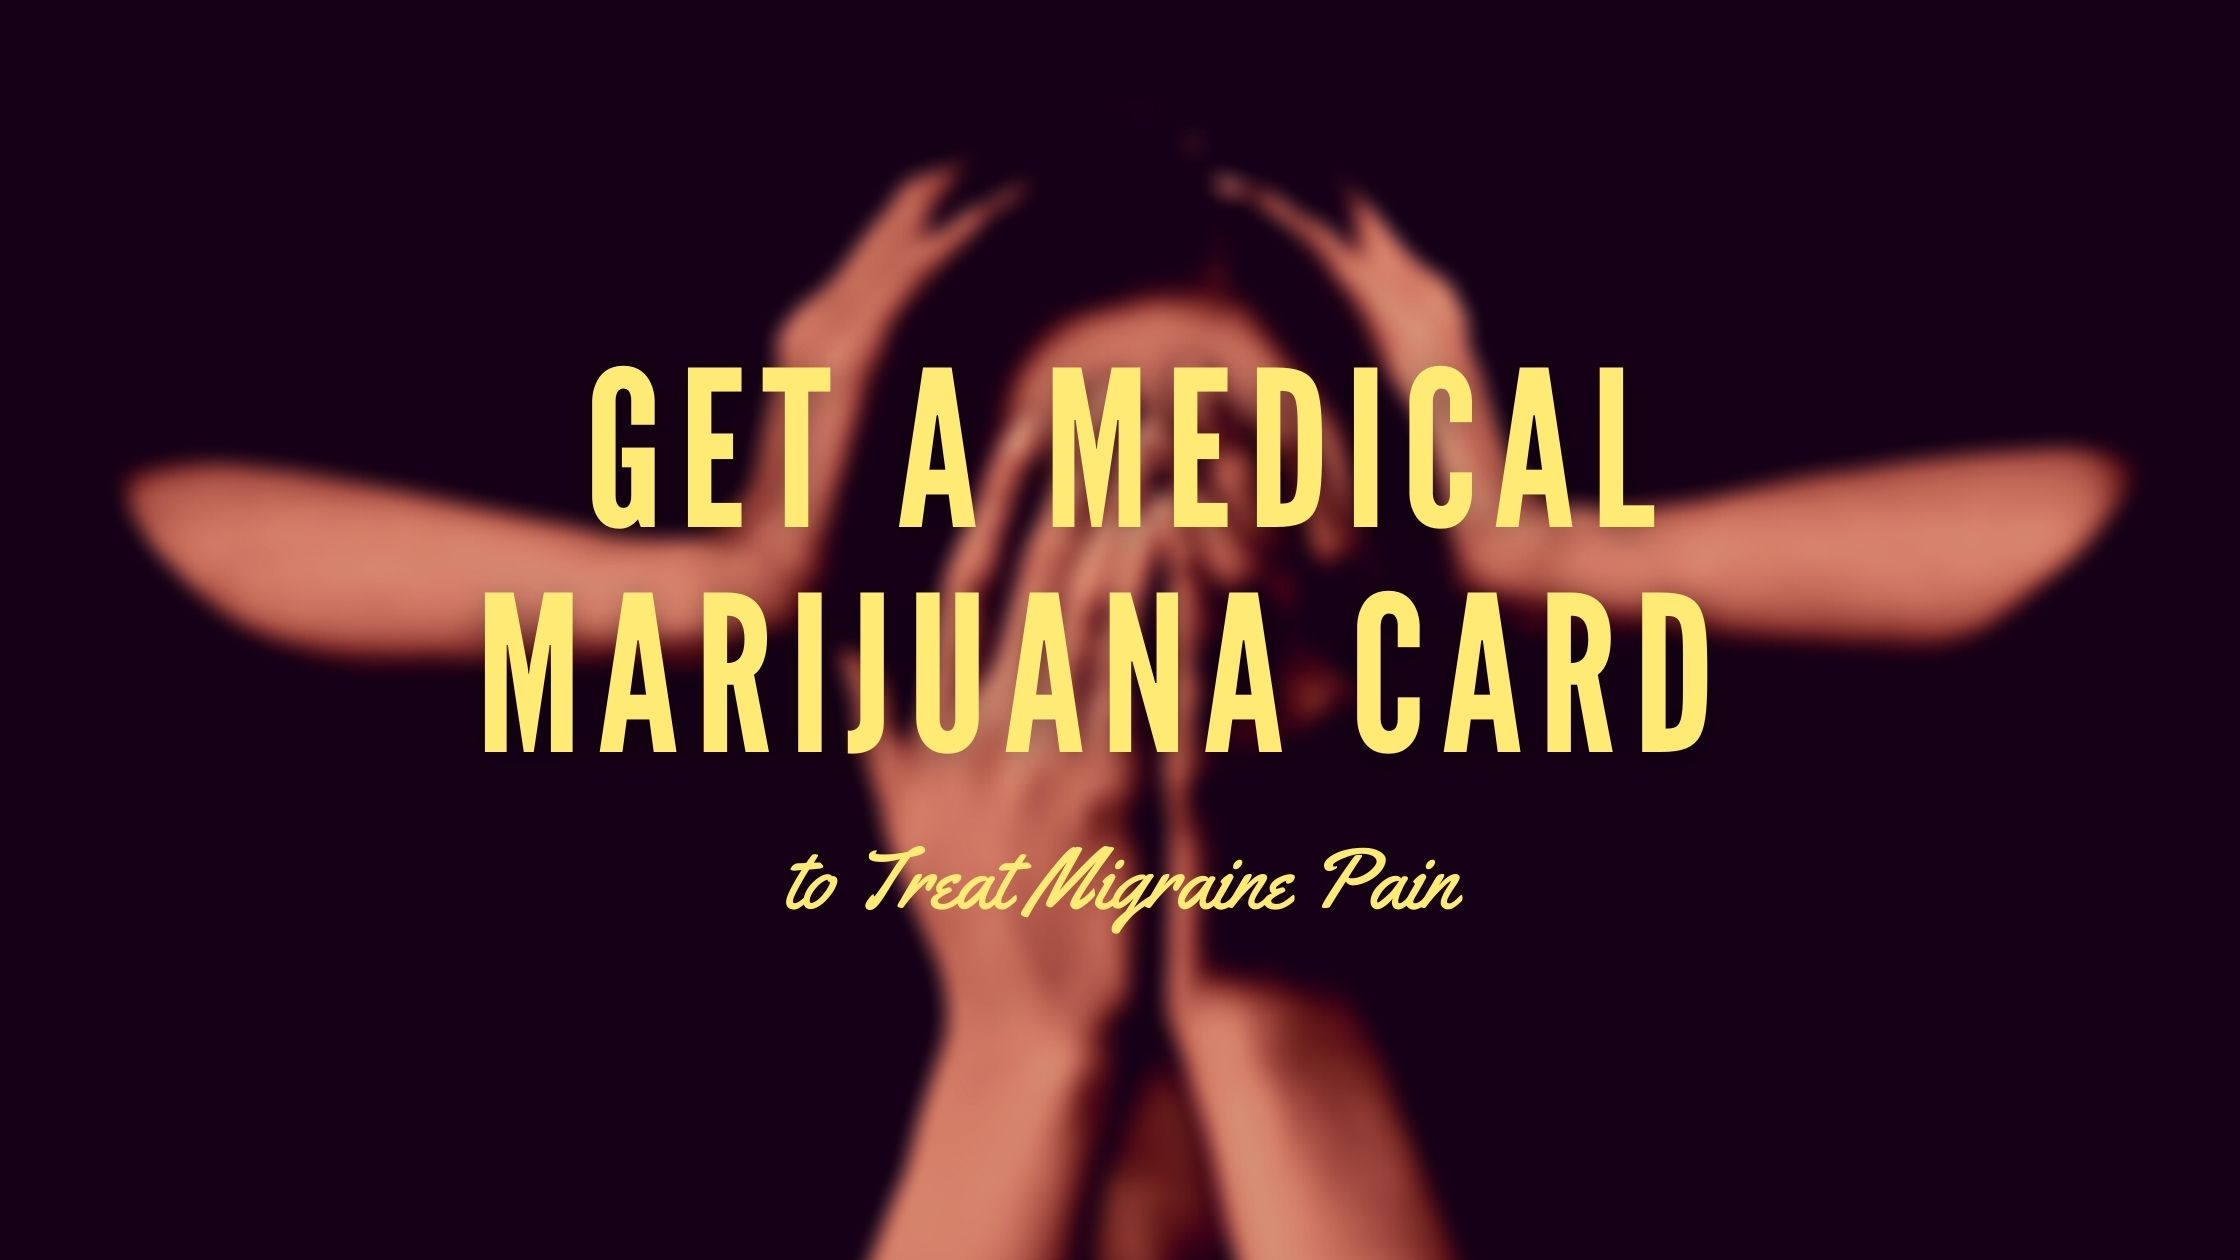 Get a Medical Marijuana Card to Treat Migraine Pain